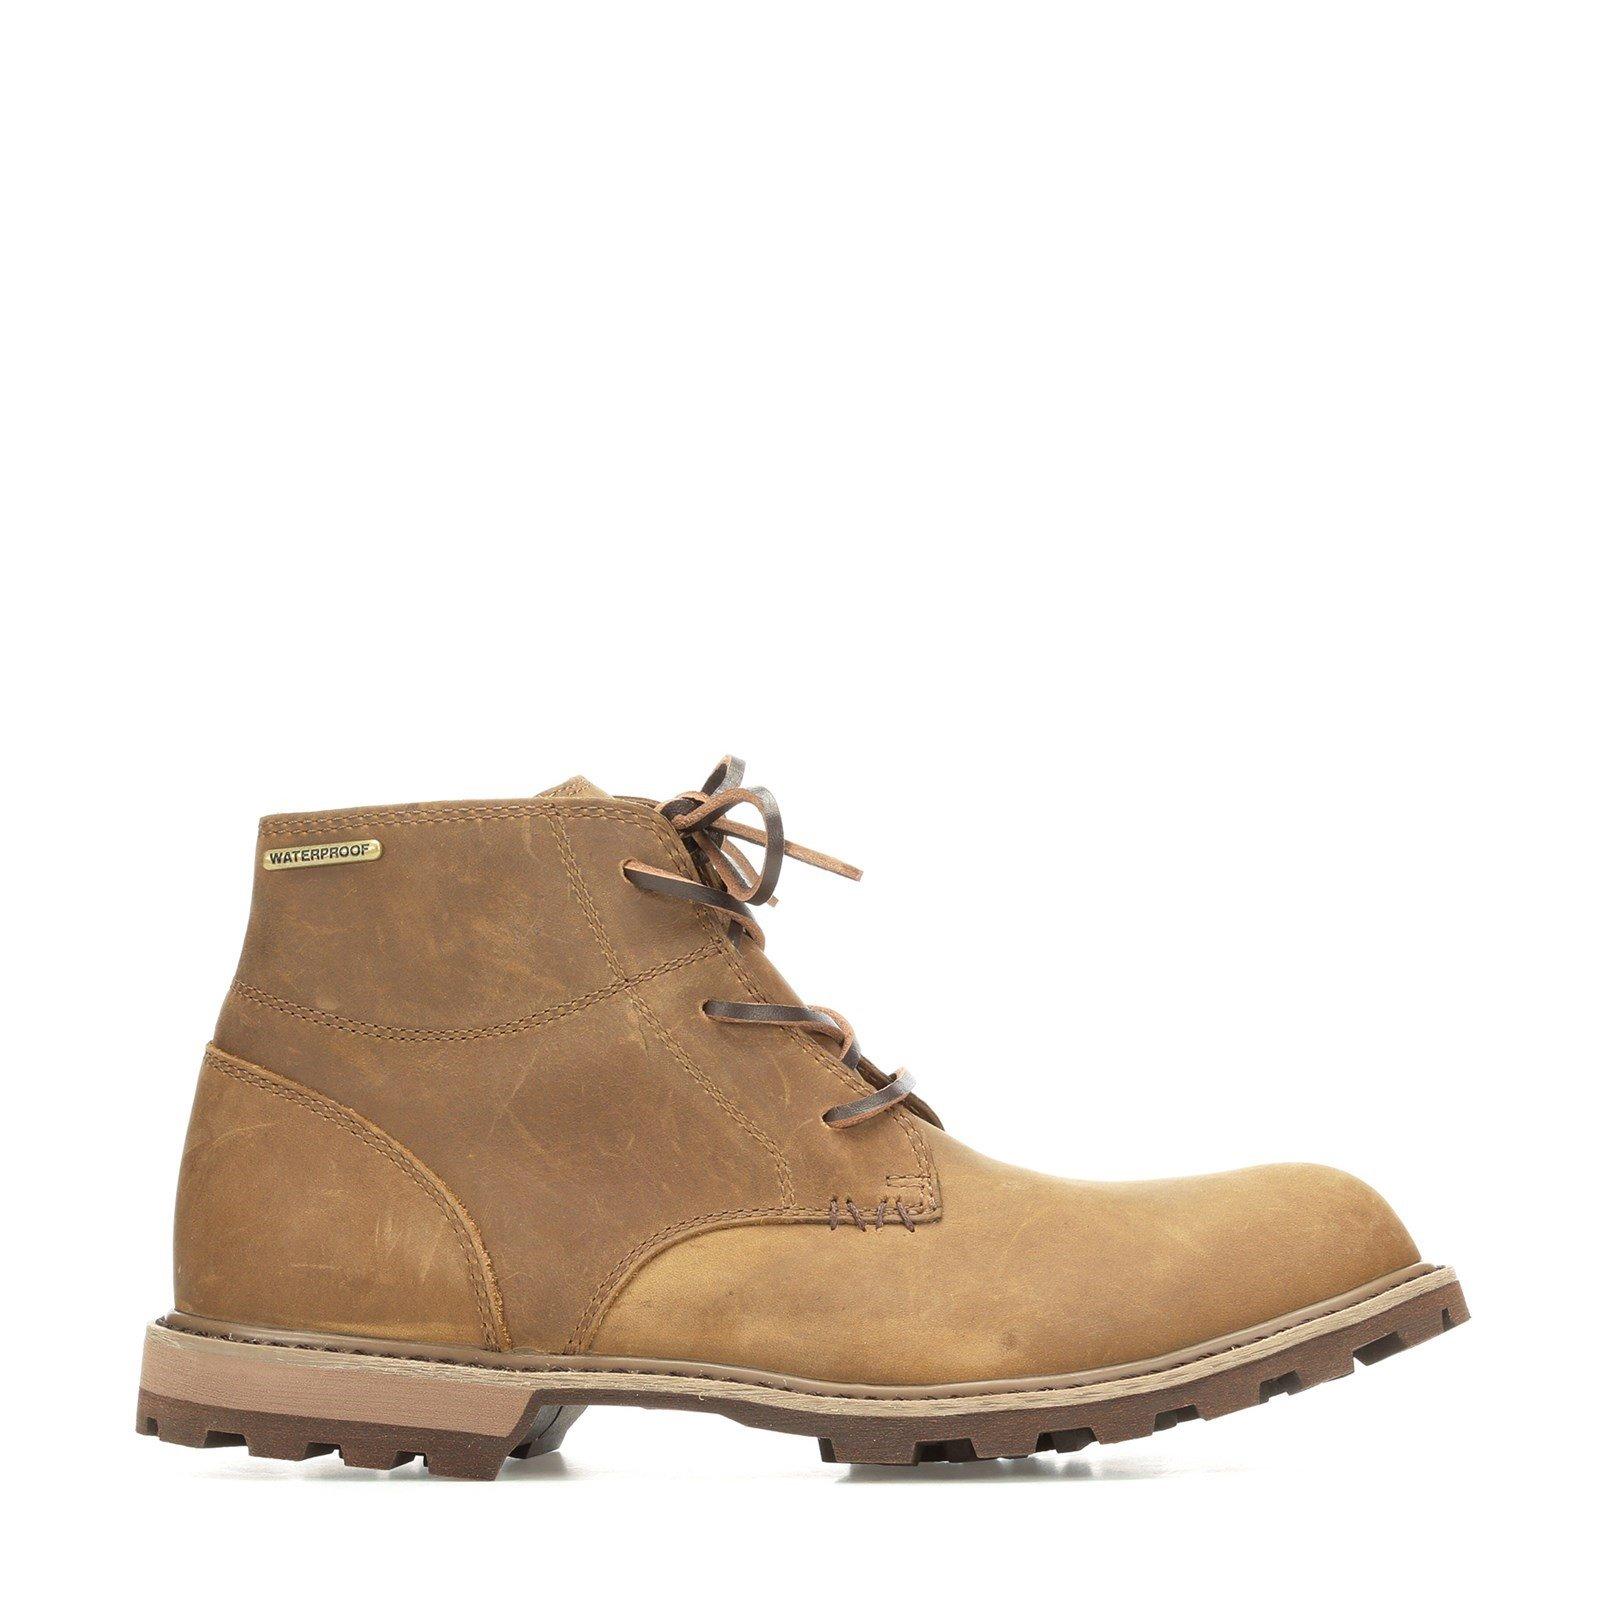 Muck Boots Men's Freeman Boot 31761 - Tan 11